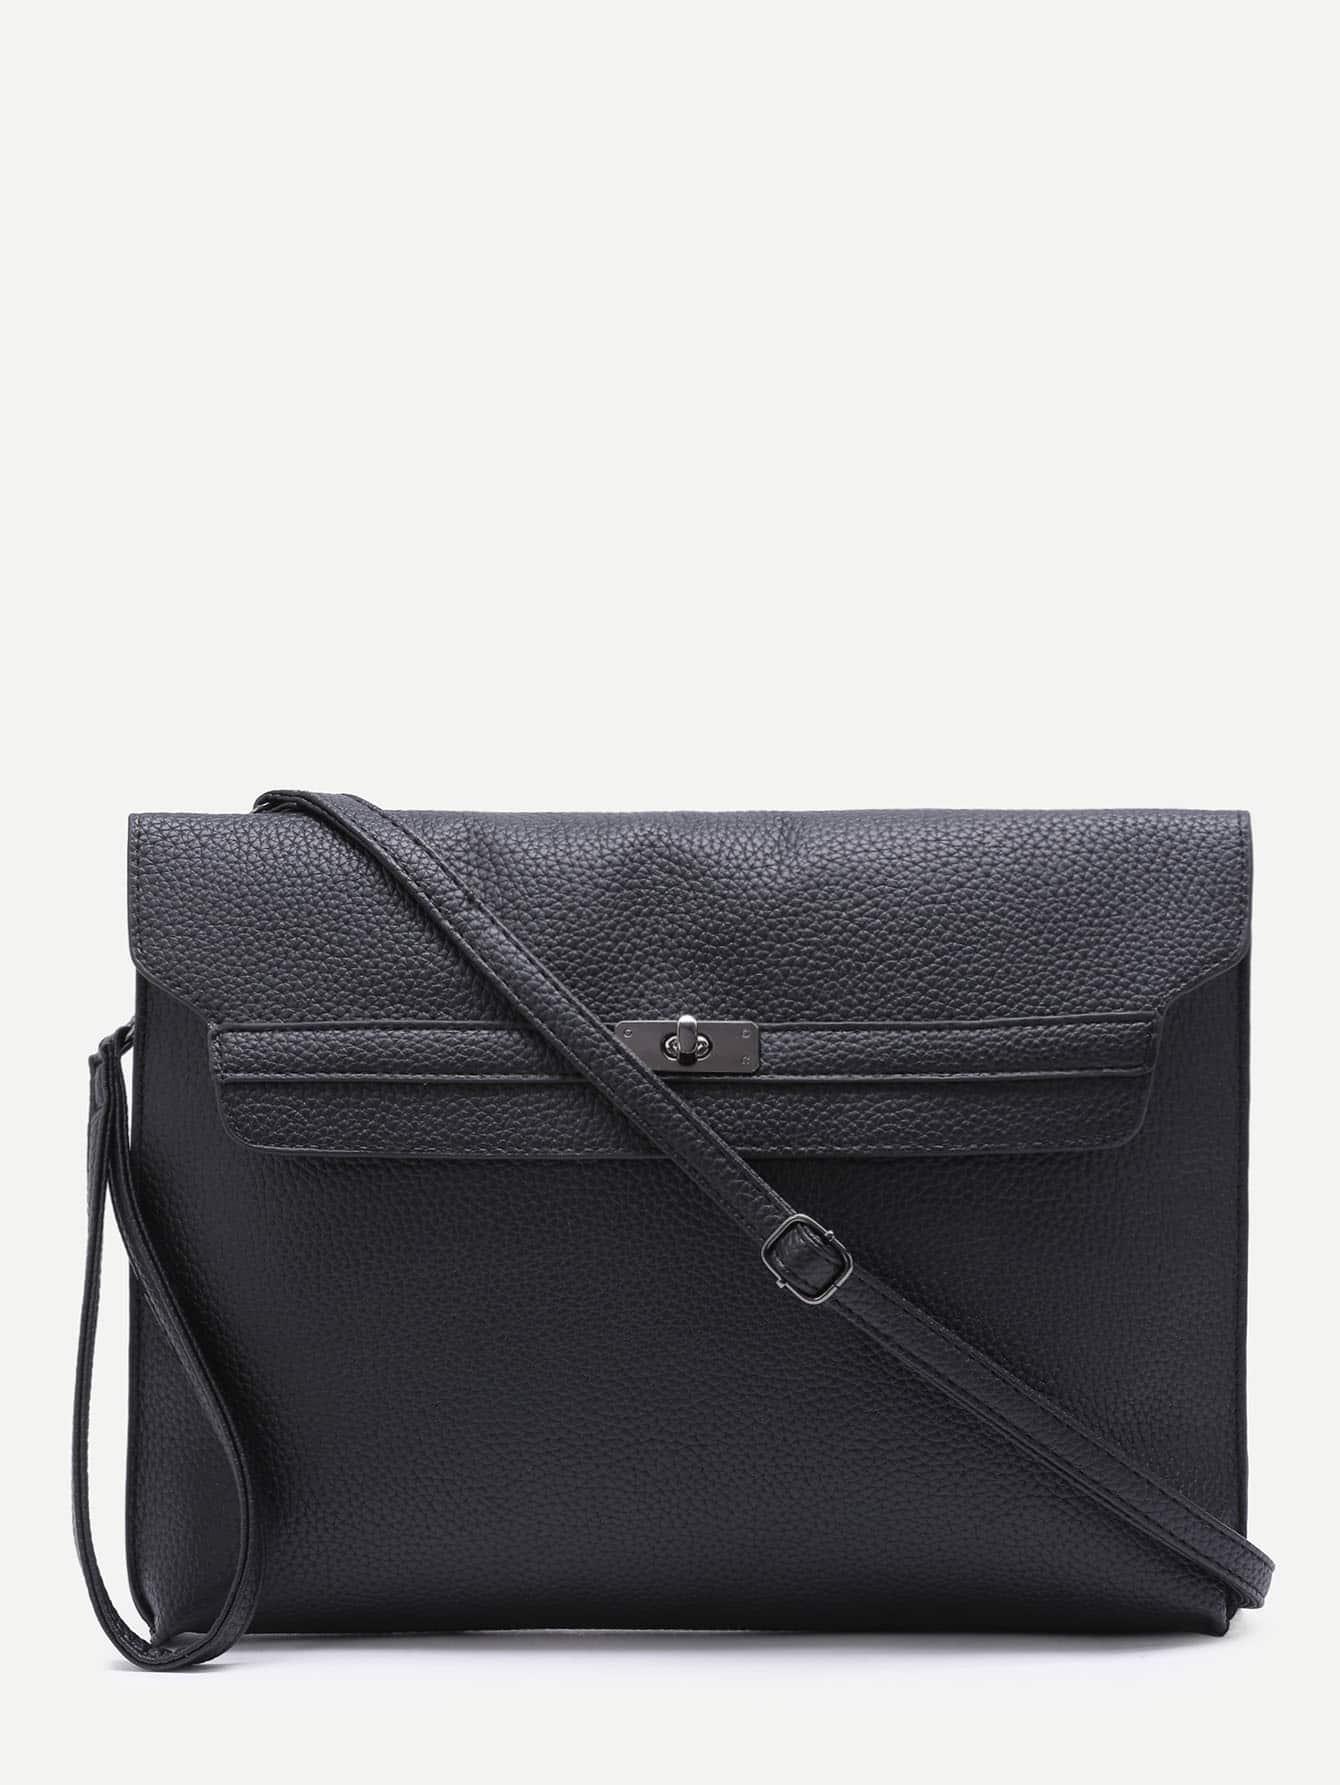 bag161104908_2